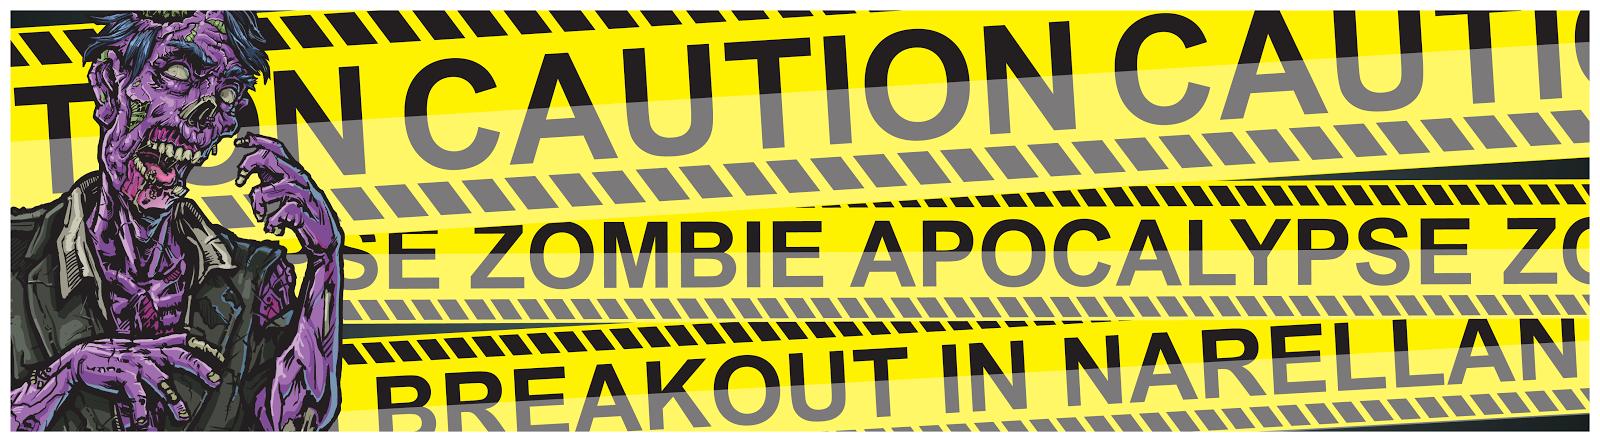 Narellan Zombie Apocalypse